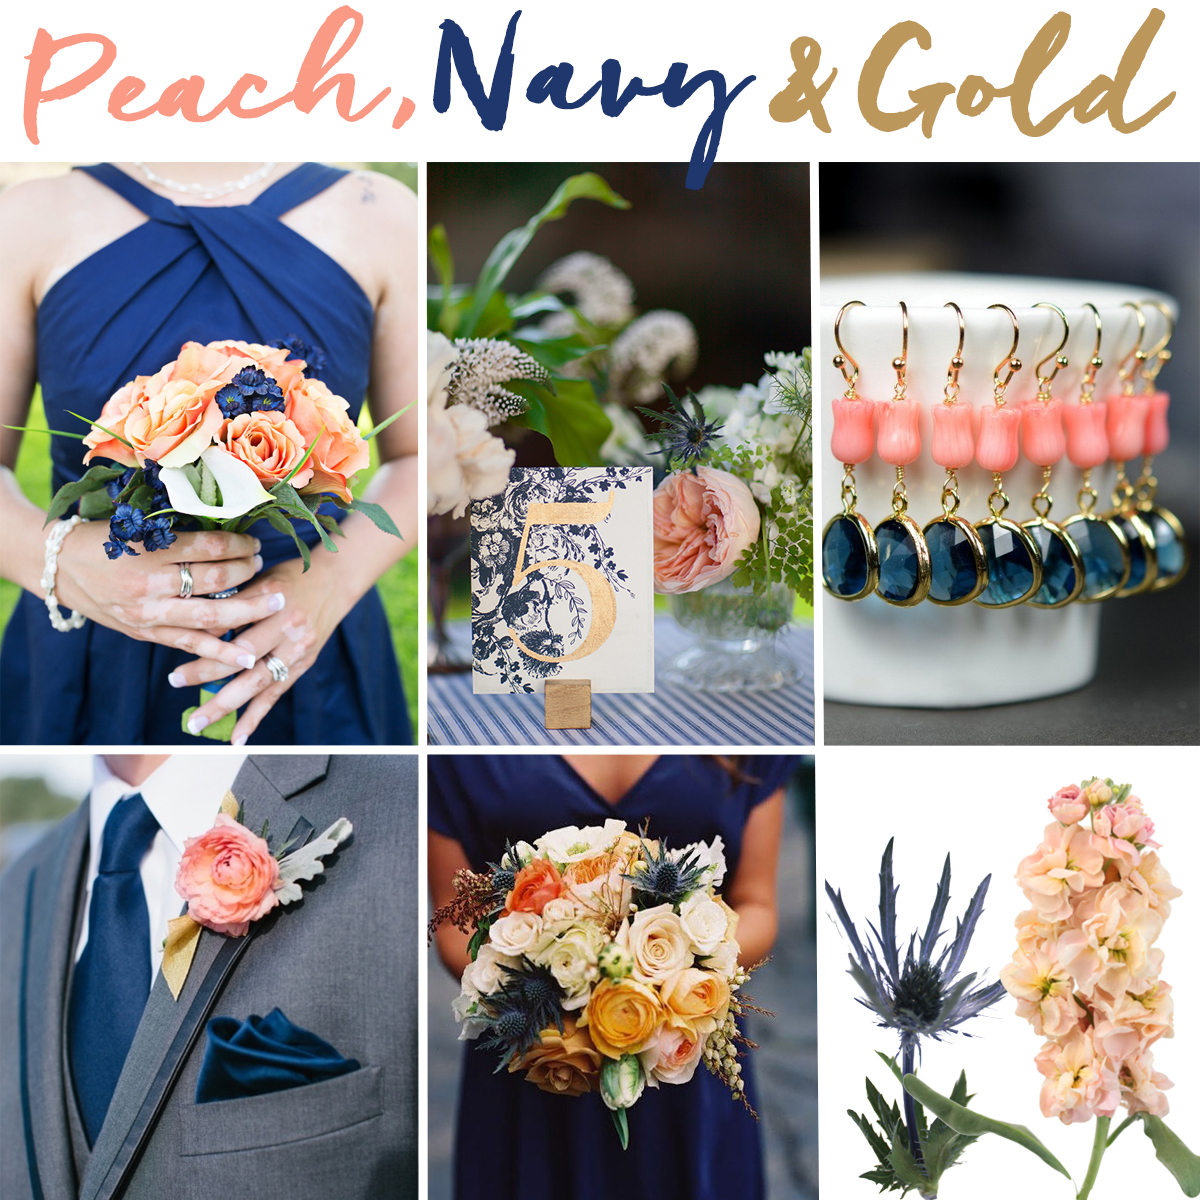 Peach-Navy-Gold-FB-size.jpg